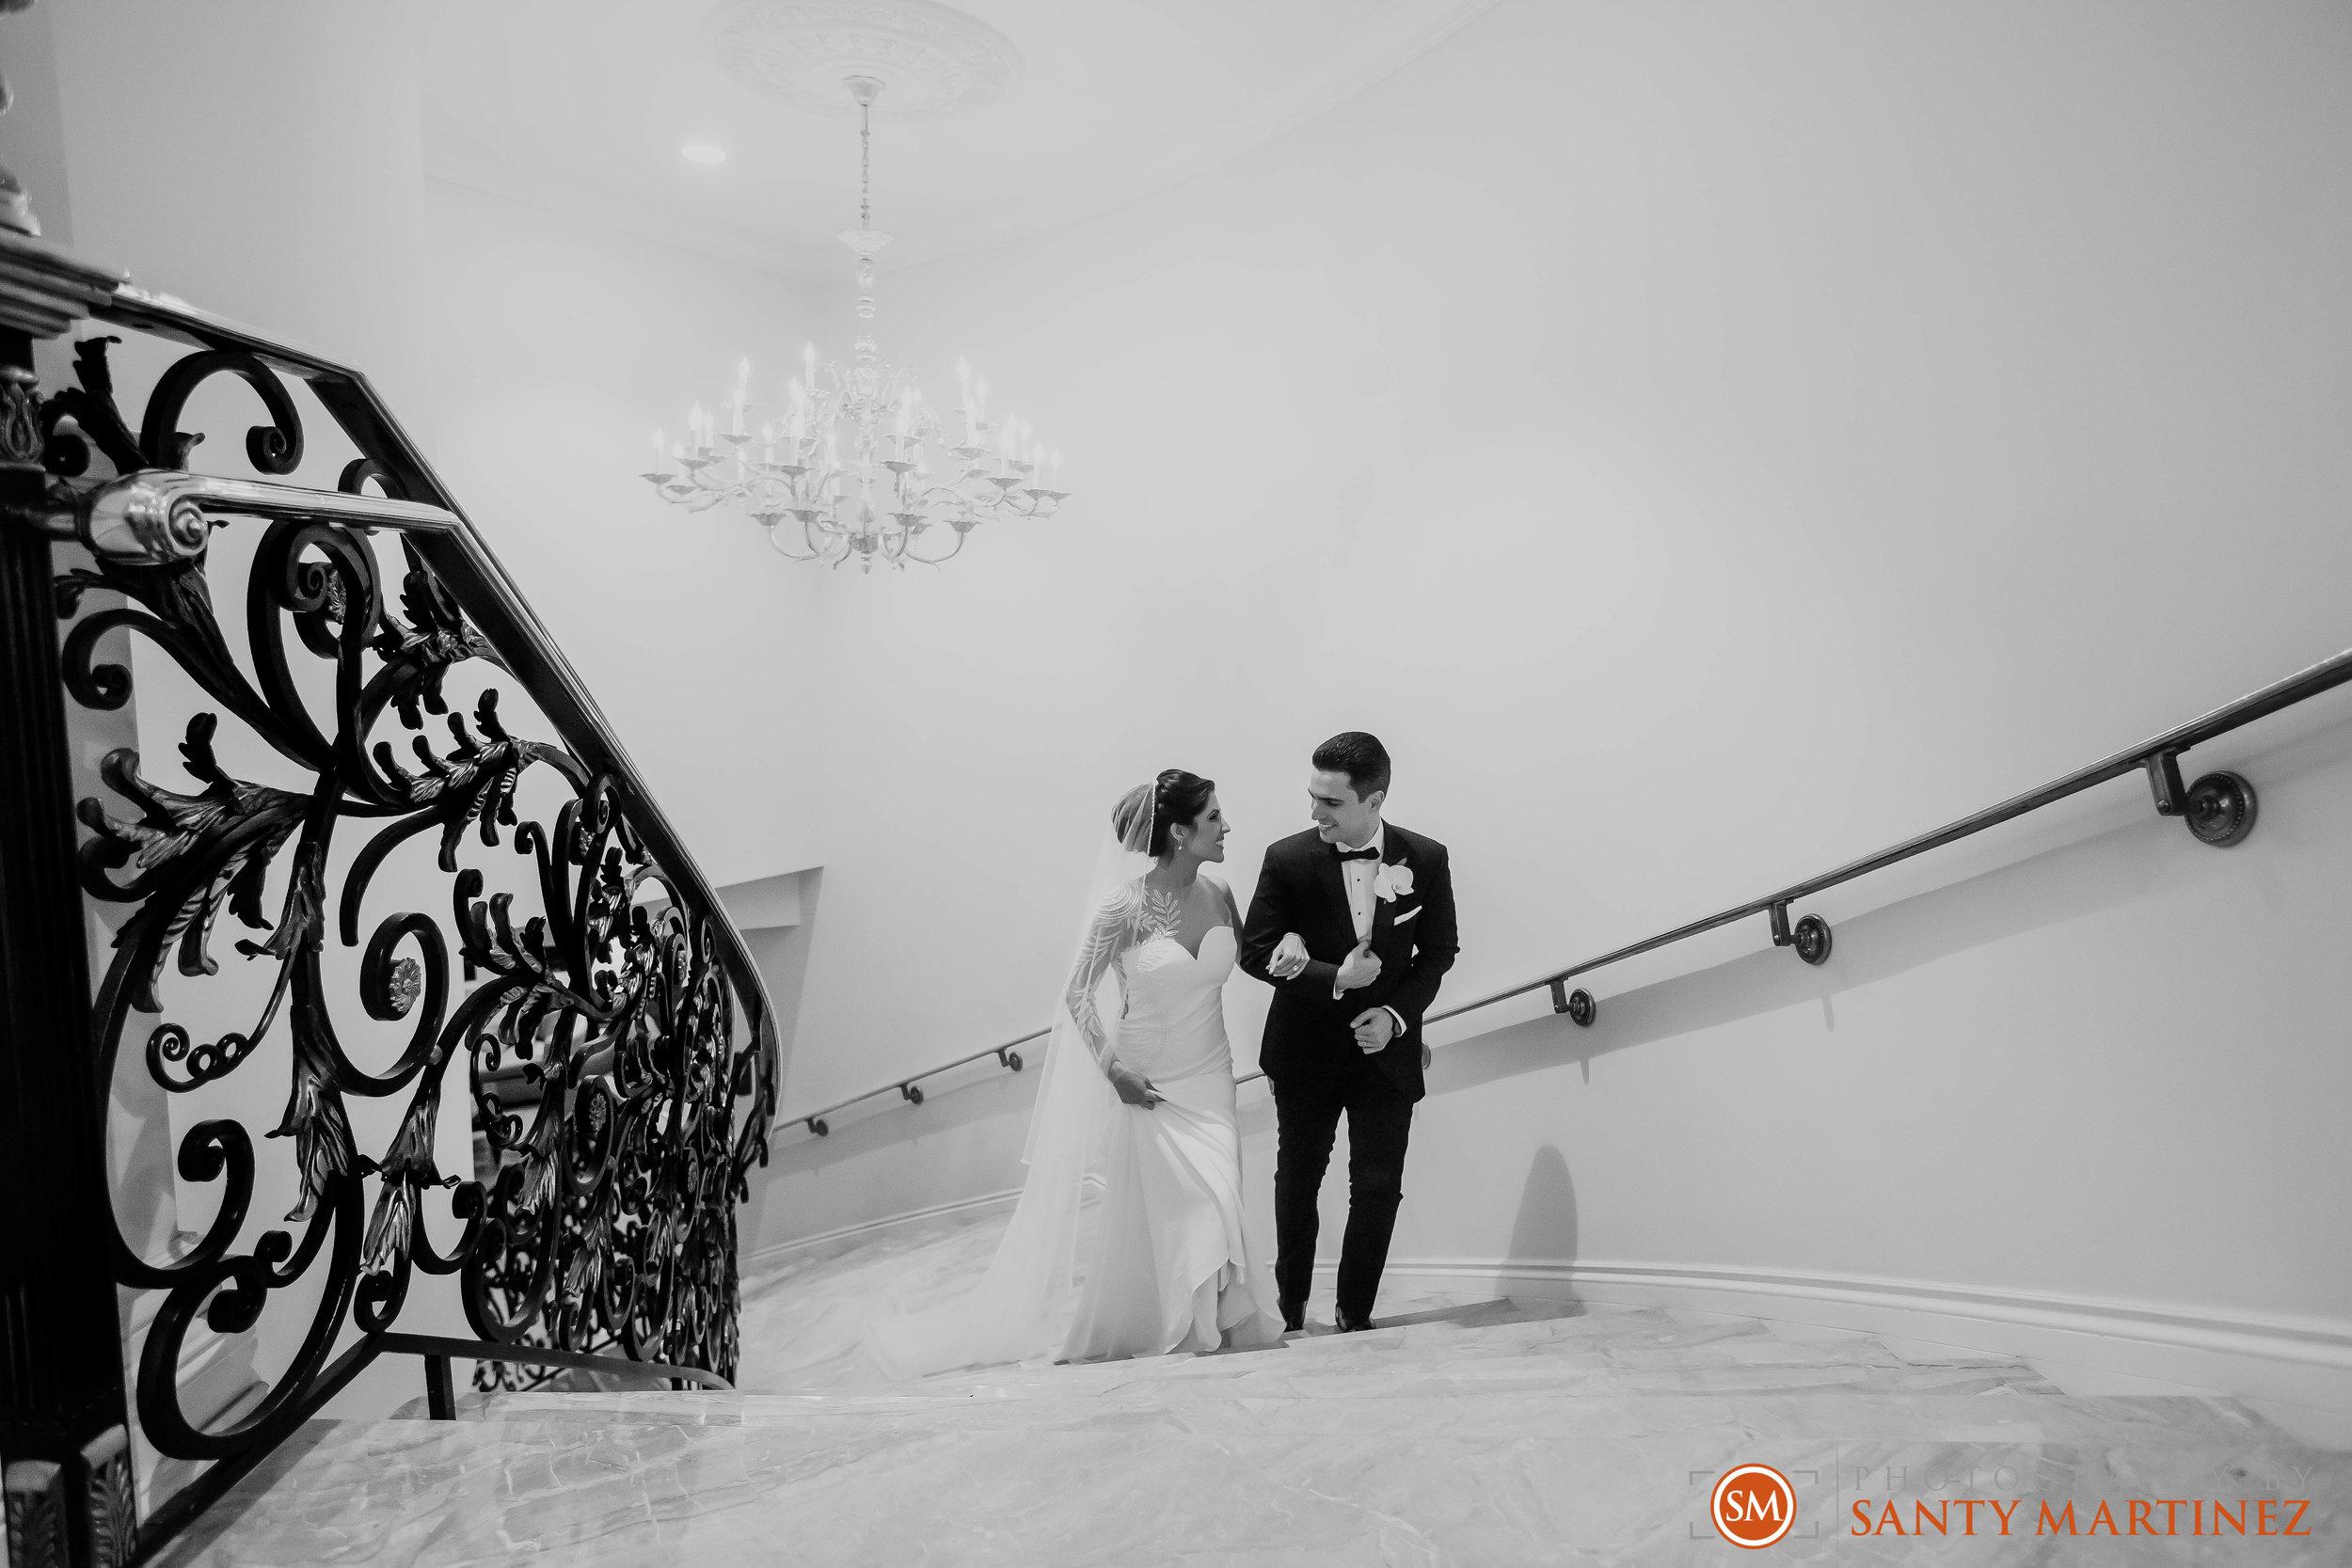 Wedding Trump National Doral Miami - Photography by Santy Martinez-23.jpg